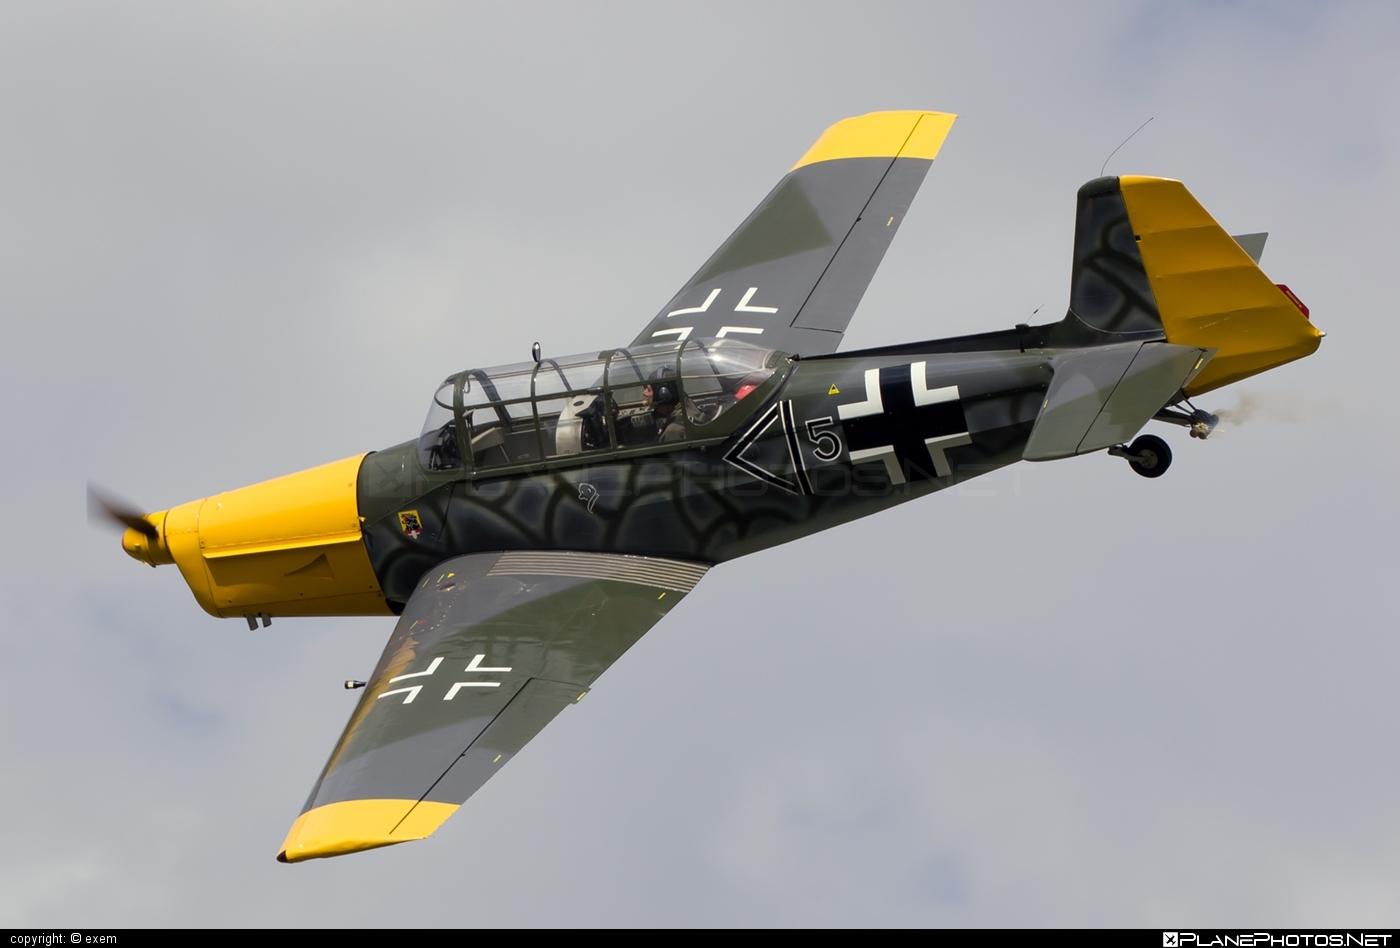 Zlin Z-226MS Trenér - OM-MHE operated by Aeroklub Martin #retroskyteam #rst #z226 #z226trener #zlin #zlin226 #zlintrener